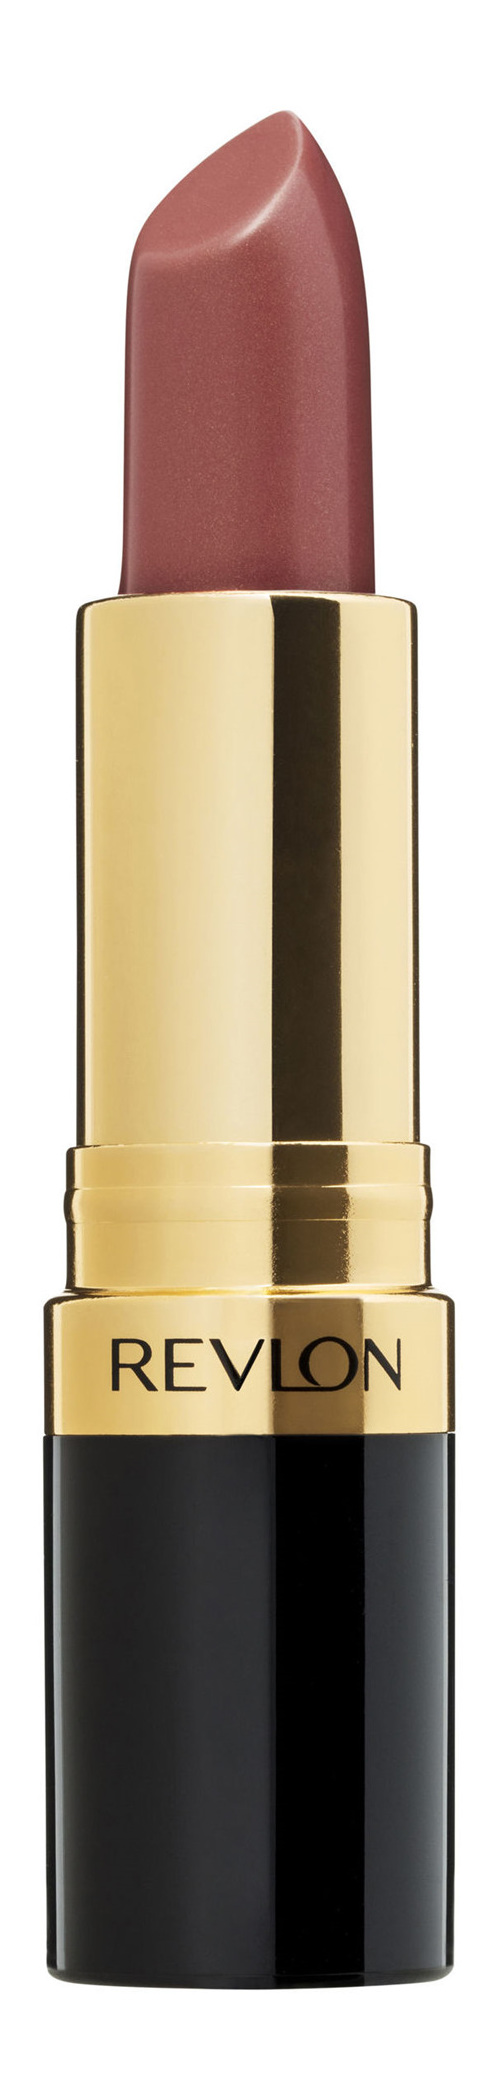 Revlon Super Lustrous™ Lipstick Blushed